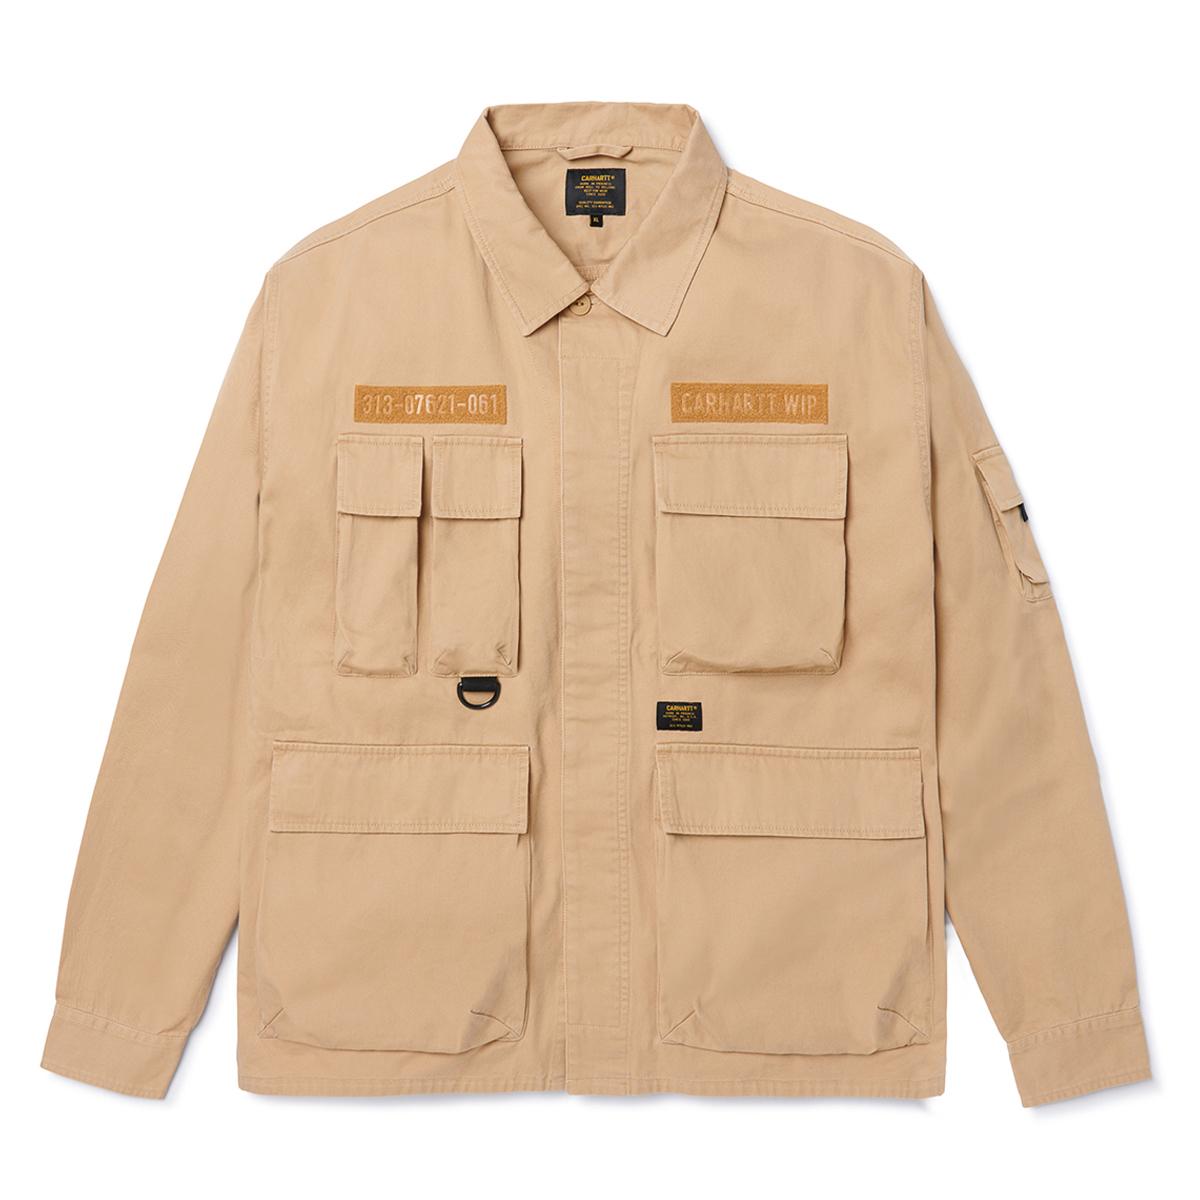 L/S Landry Shirt